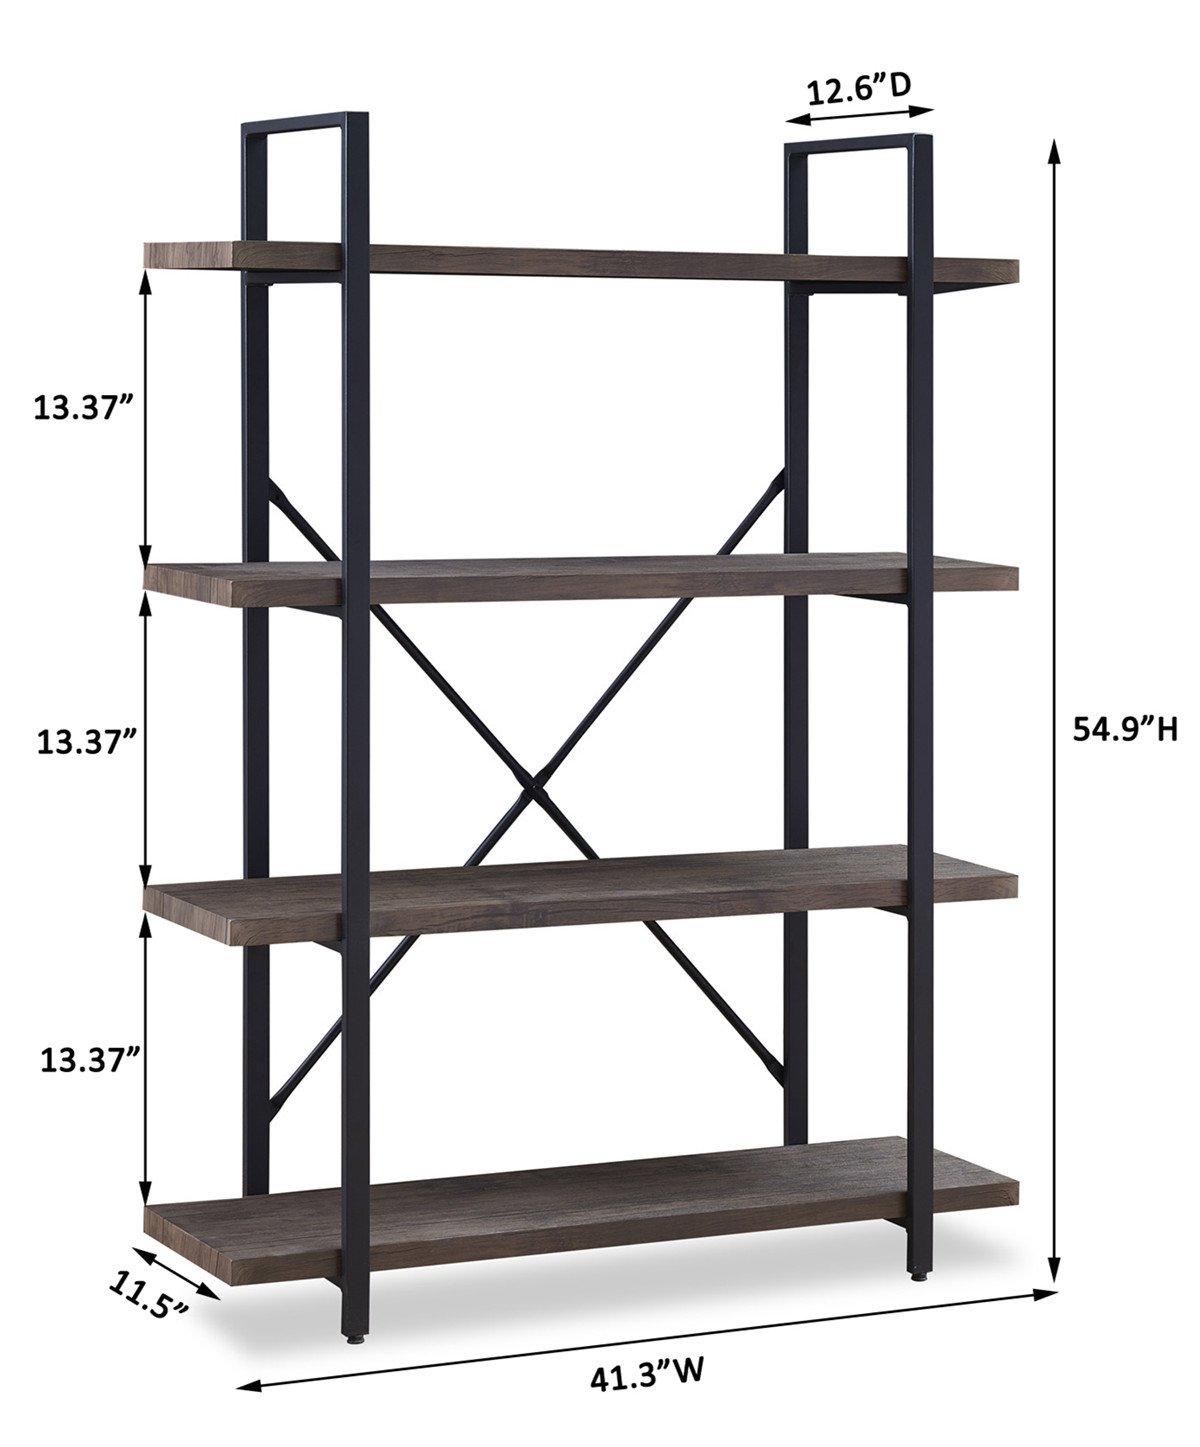 O&K FURNITURE 4-Shelf Vintage Industrial Bookcase, Display Rack Stand Storage Shelving Unit, Gray-Brown by O&K FURNITURE (Image #5)